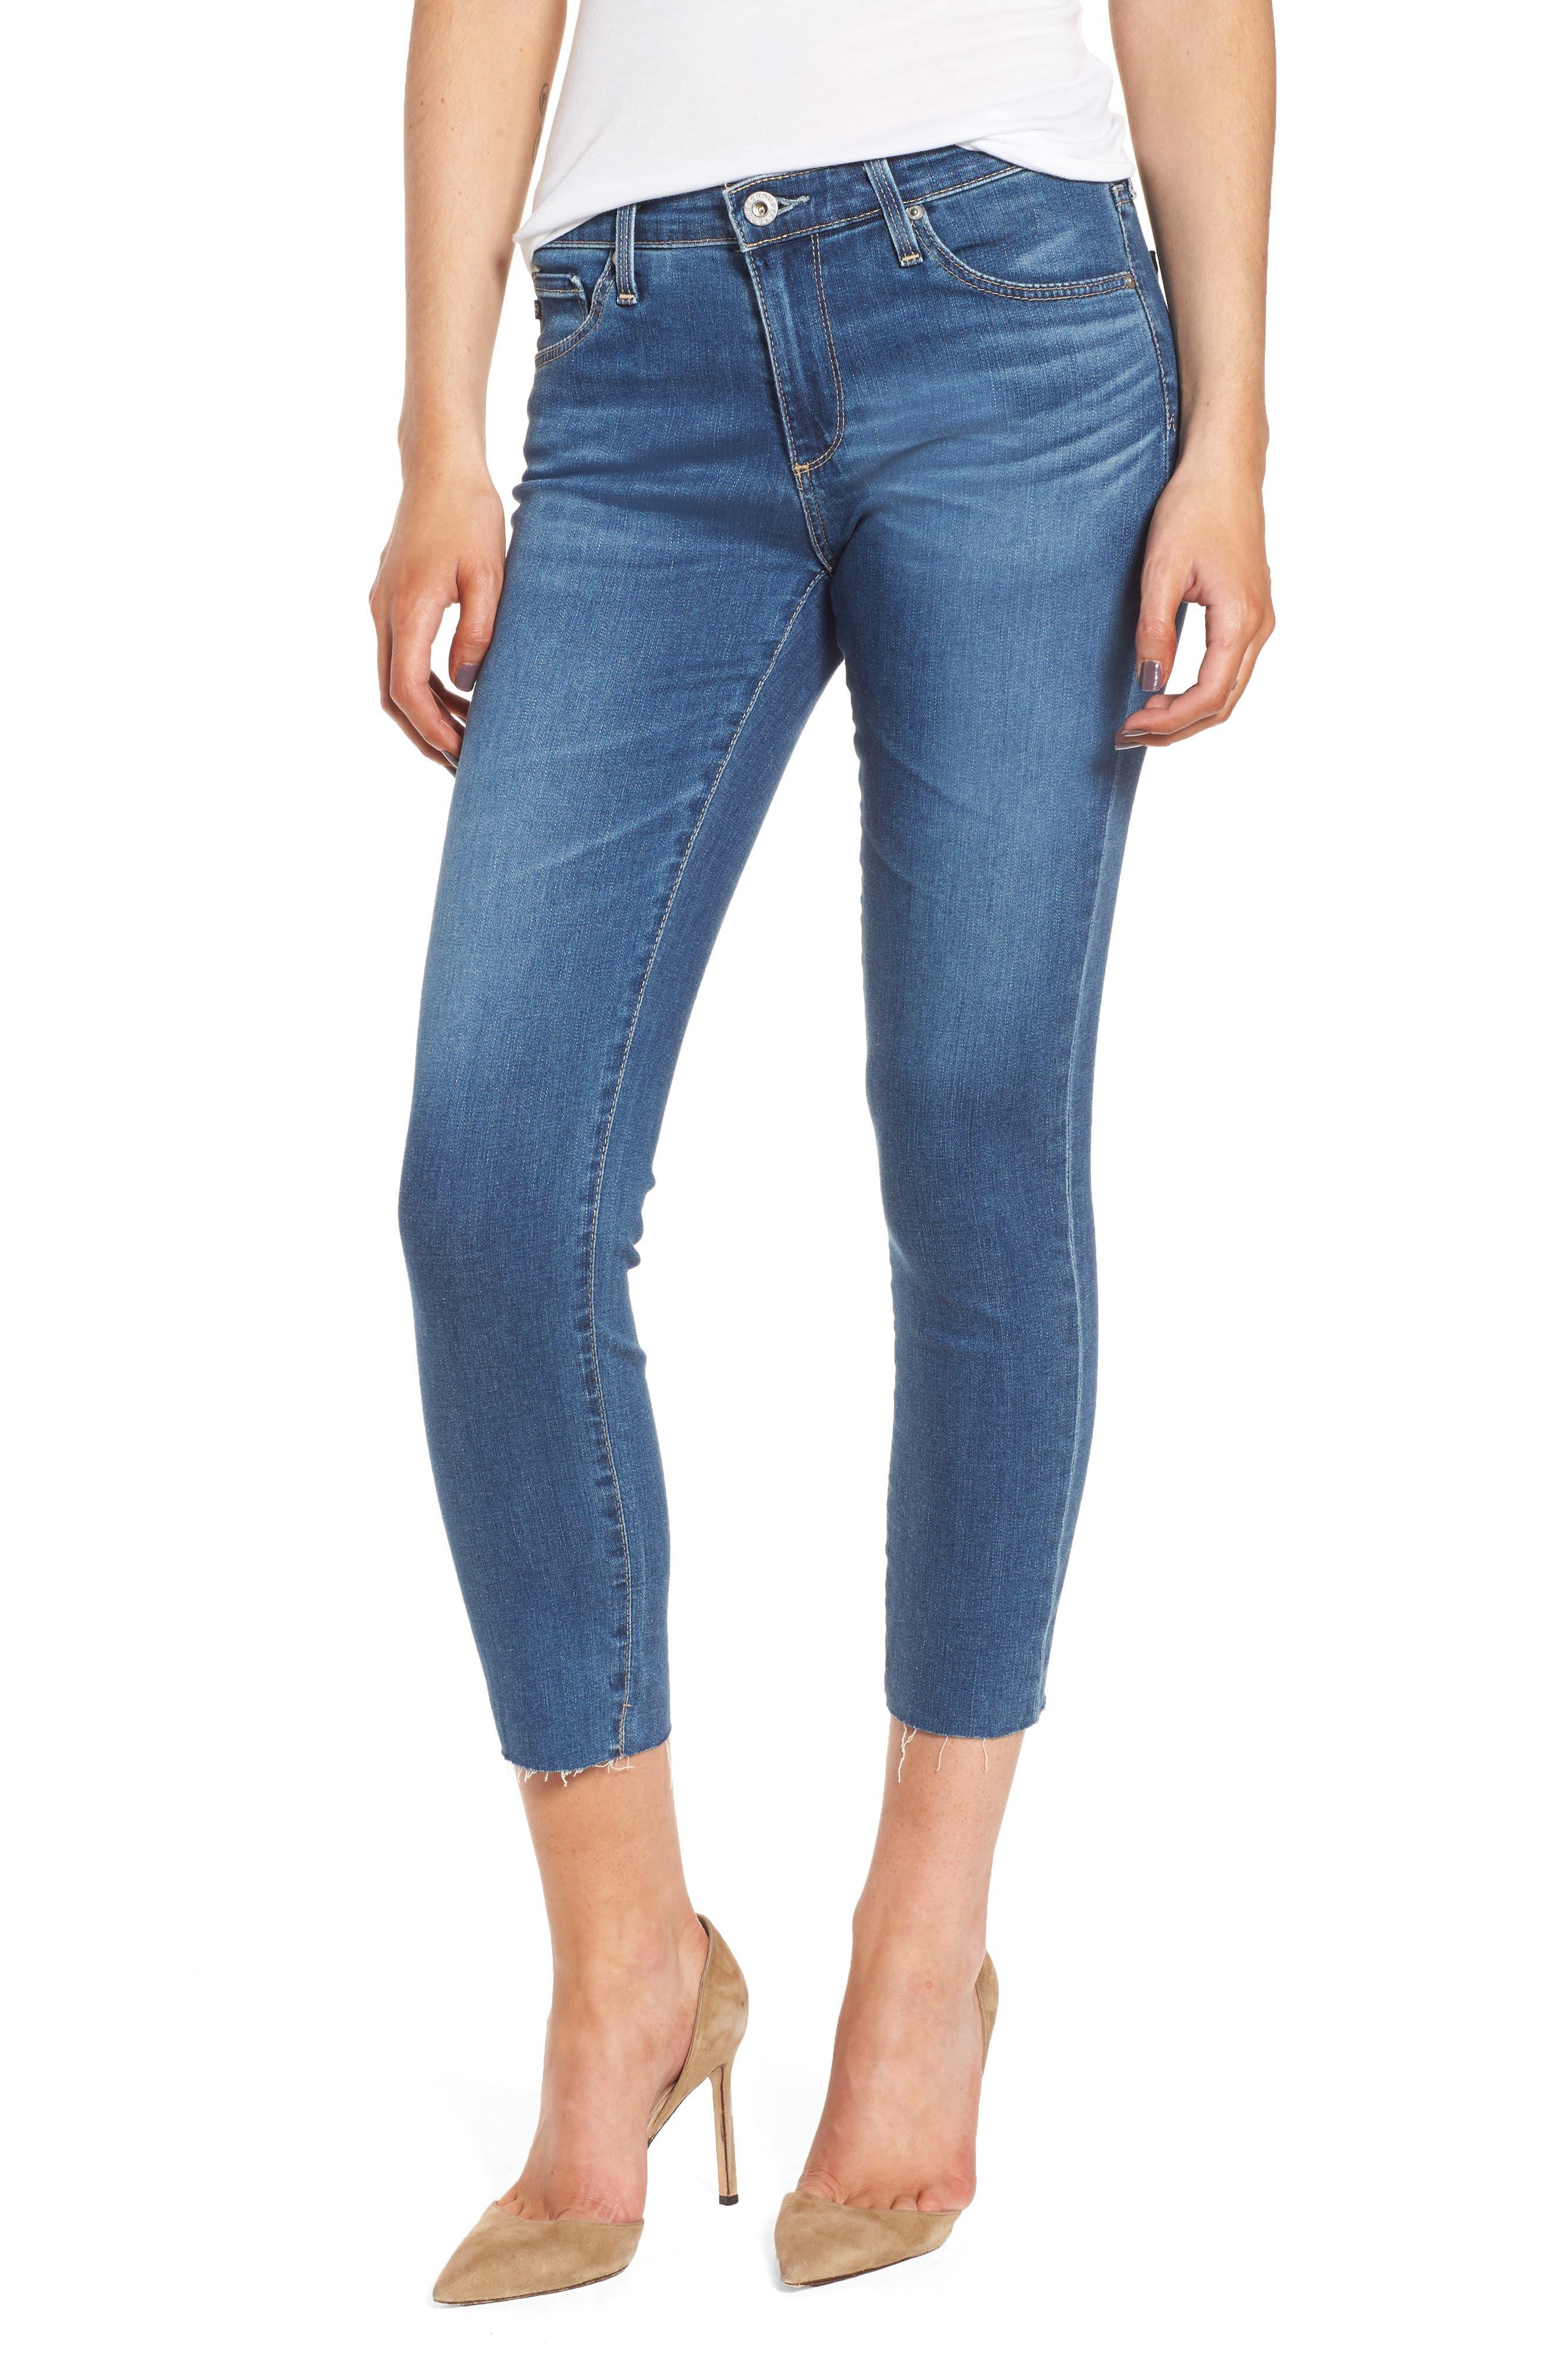 Alternate Image 1 Selected - AG Prima Crop Skinny Jeans (Indigo Viking)